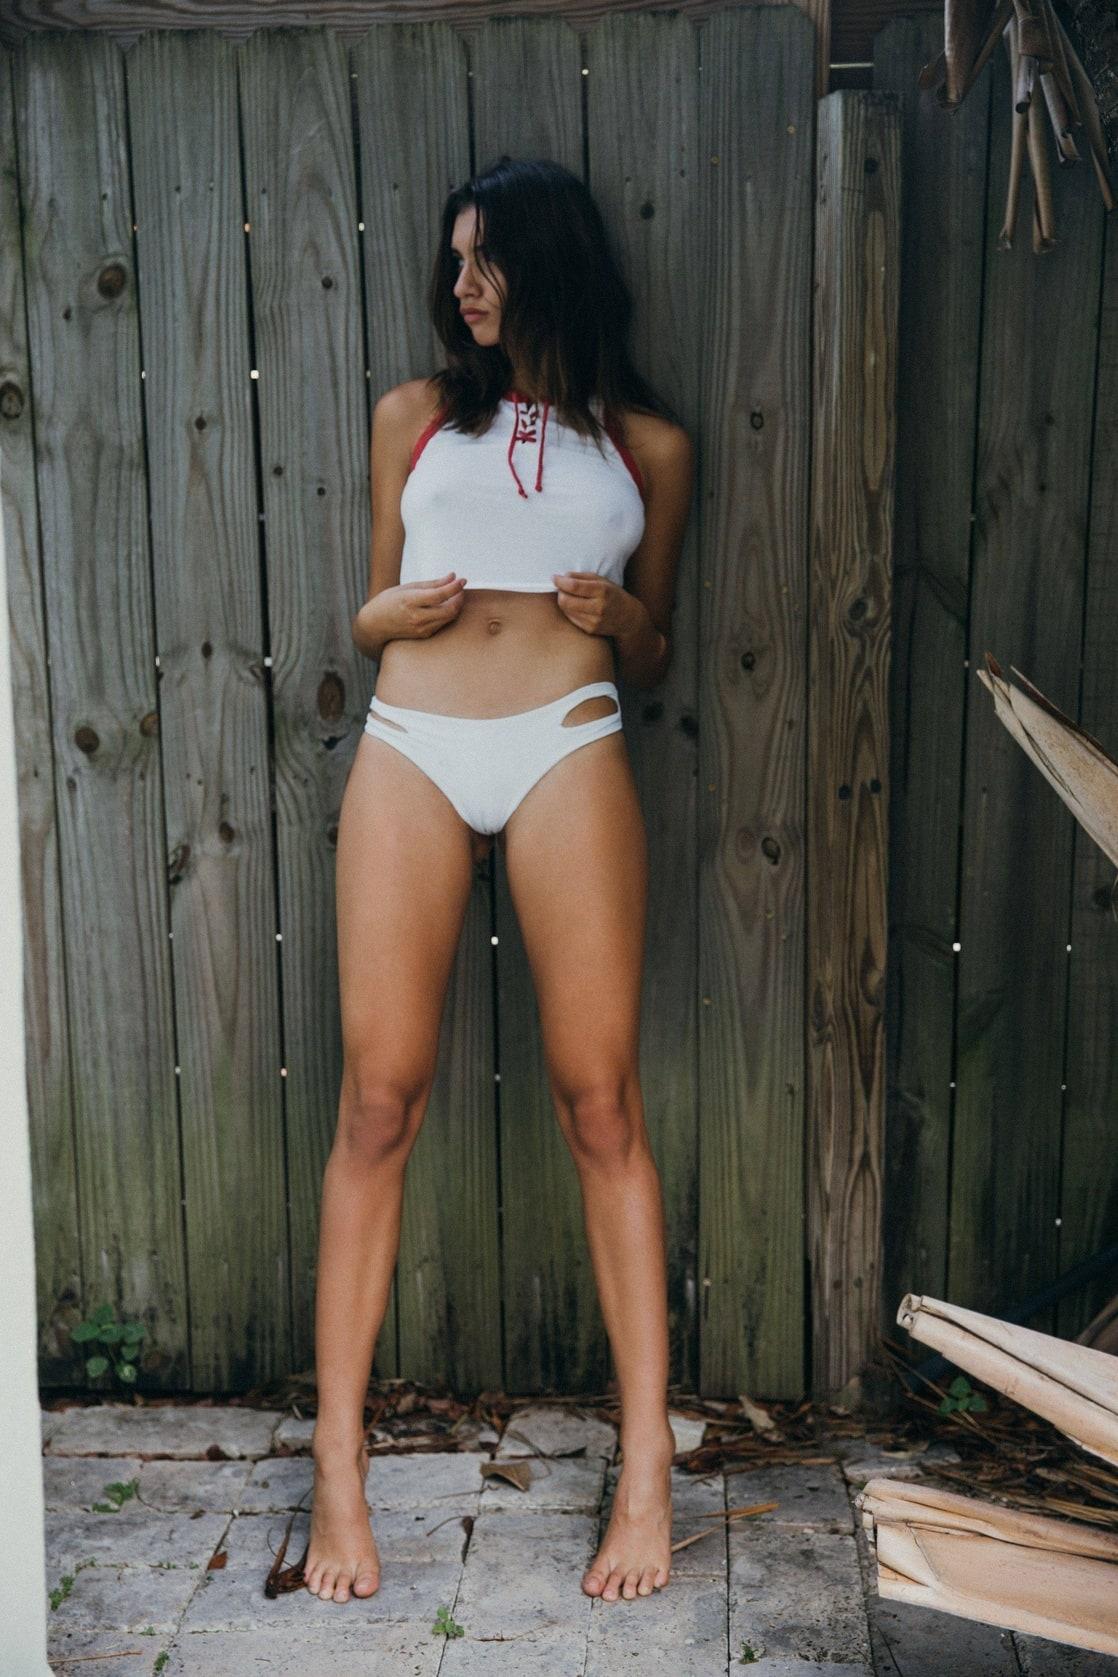 Bikini Chanel Postrel nude (74 photo), Tits, Cleavage, Instagram, lingerie 2019